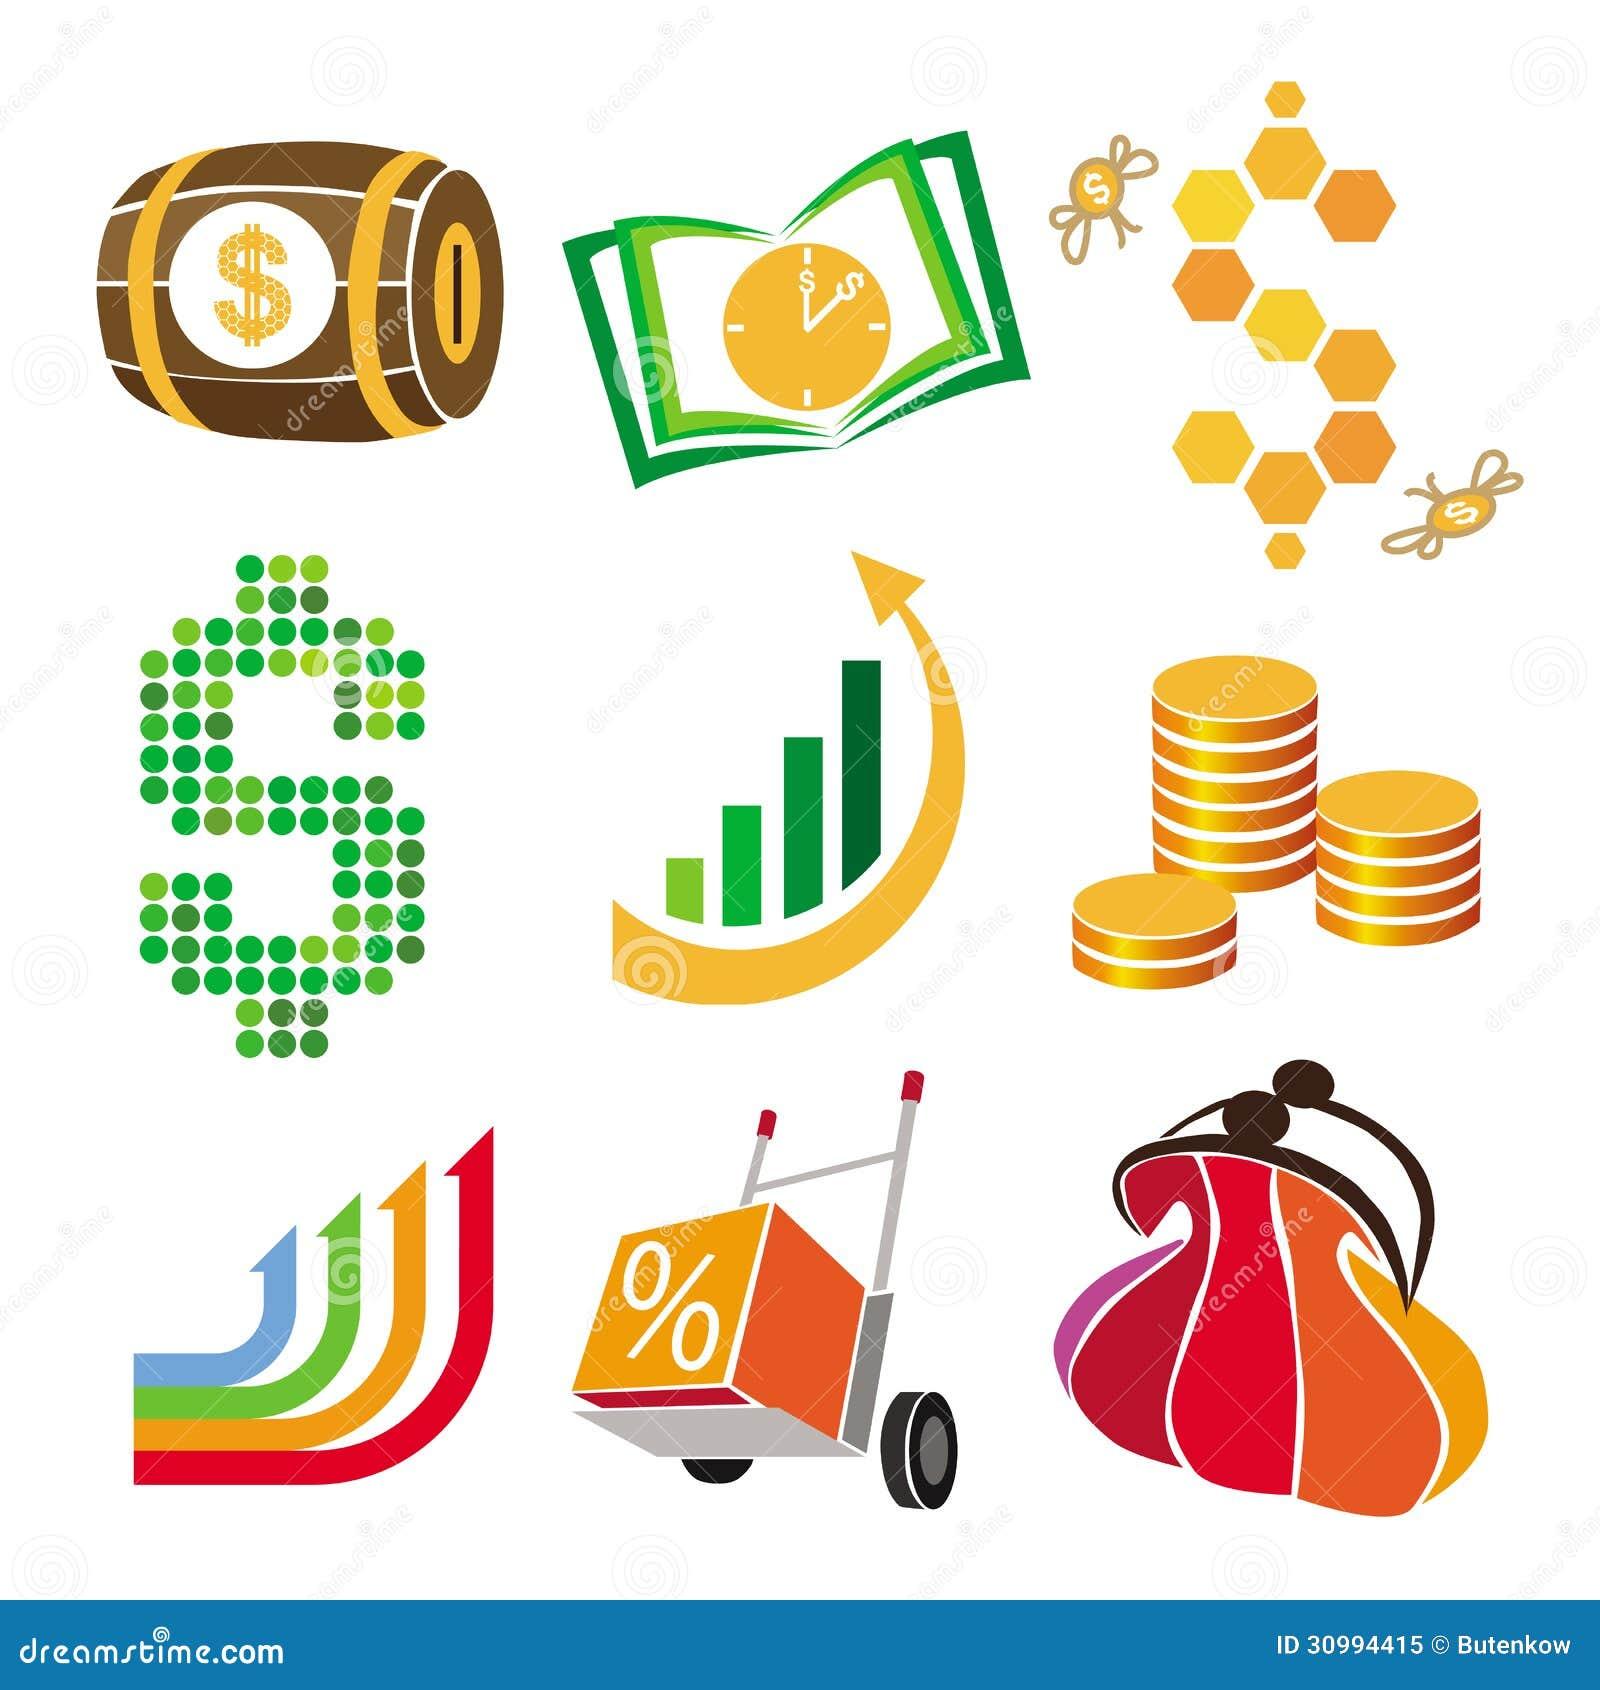 Finance Graphics: Vector Icons Of Finance, Money Stock Illustration